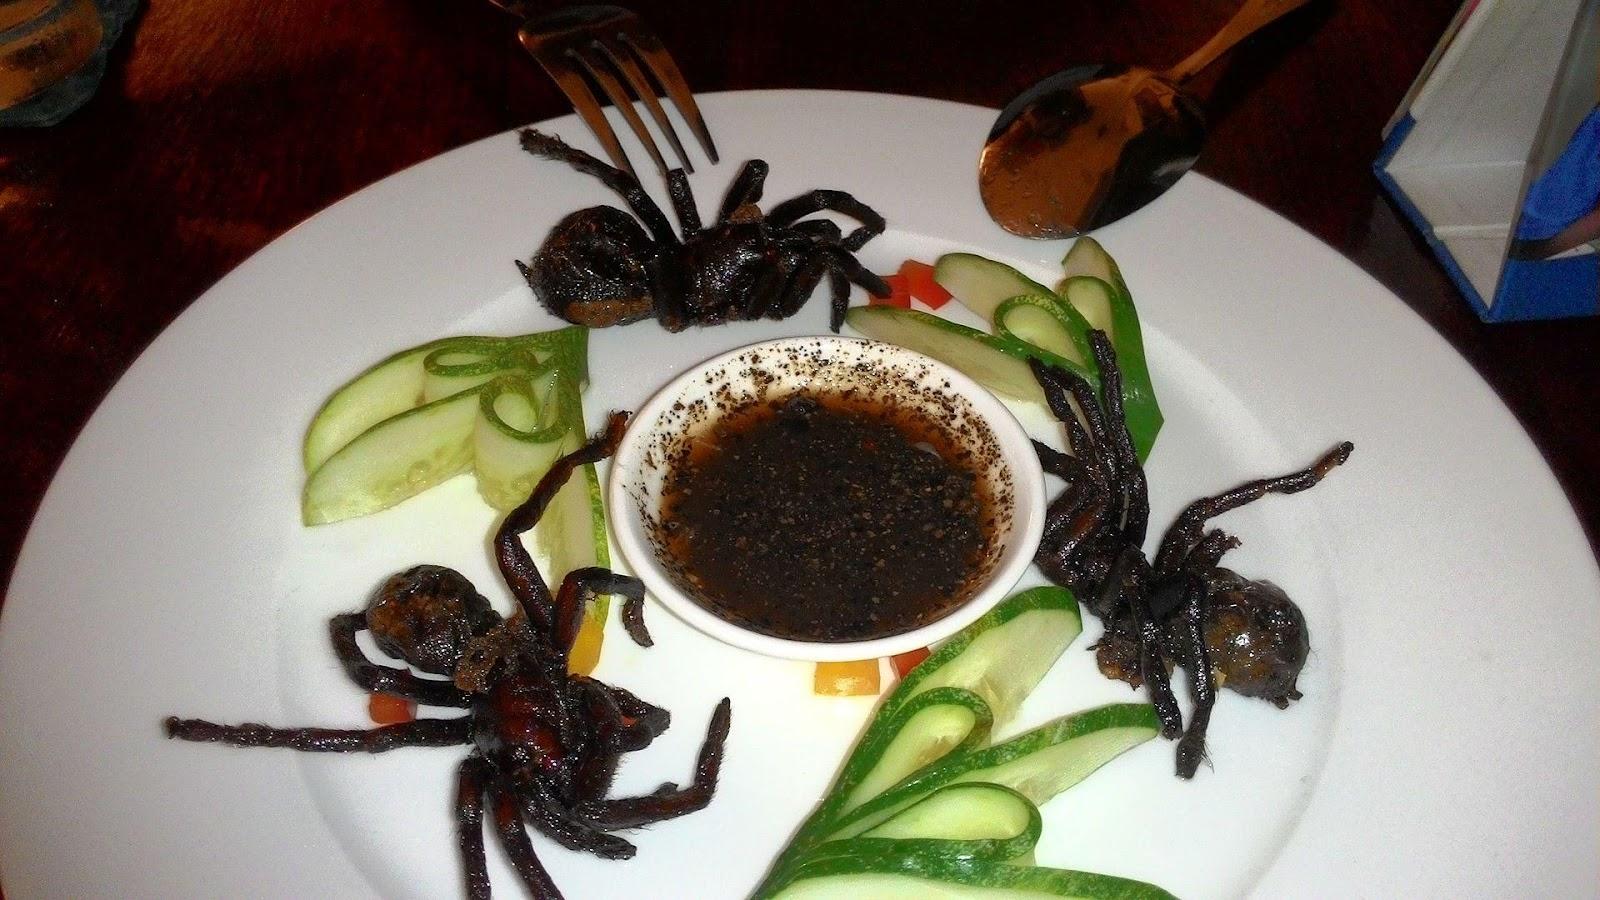 https://upload.wikimedia.org/wikipedia/commons/thumb/c/c7/Fried_Tarantula_in_Cambodian_Restaurant.jpg/1920px-Fried_Tarantula_in_Cambodian_Restaurant.jpg